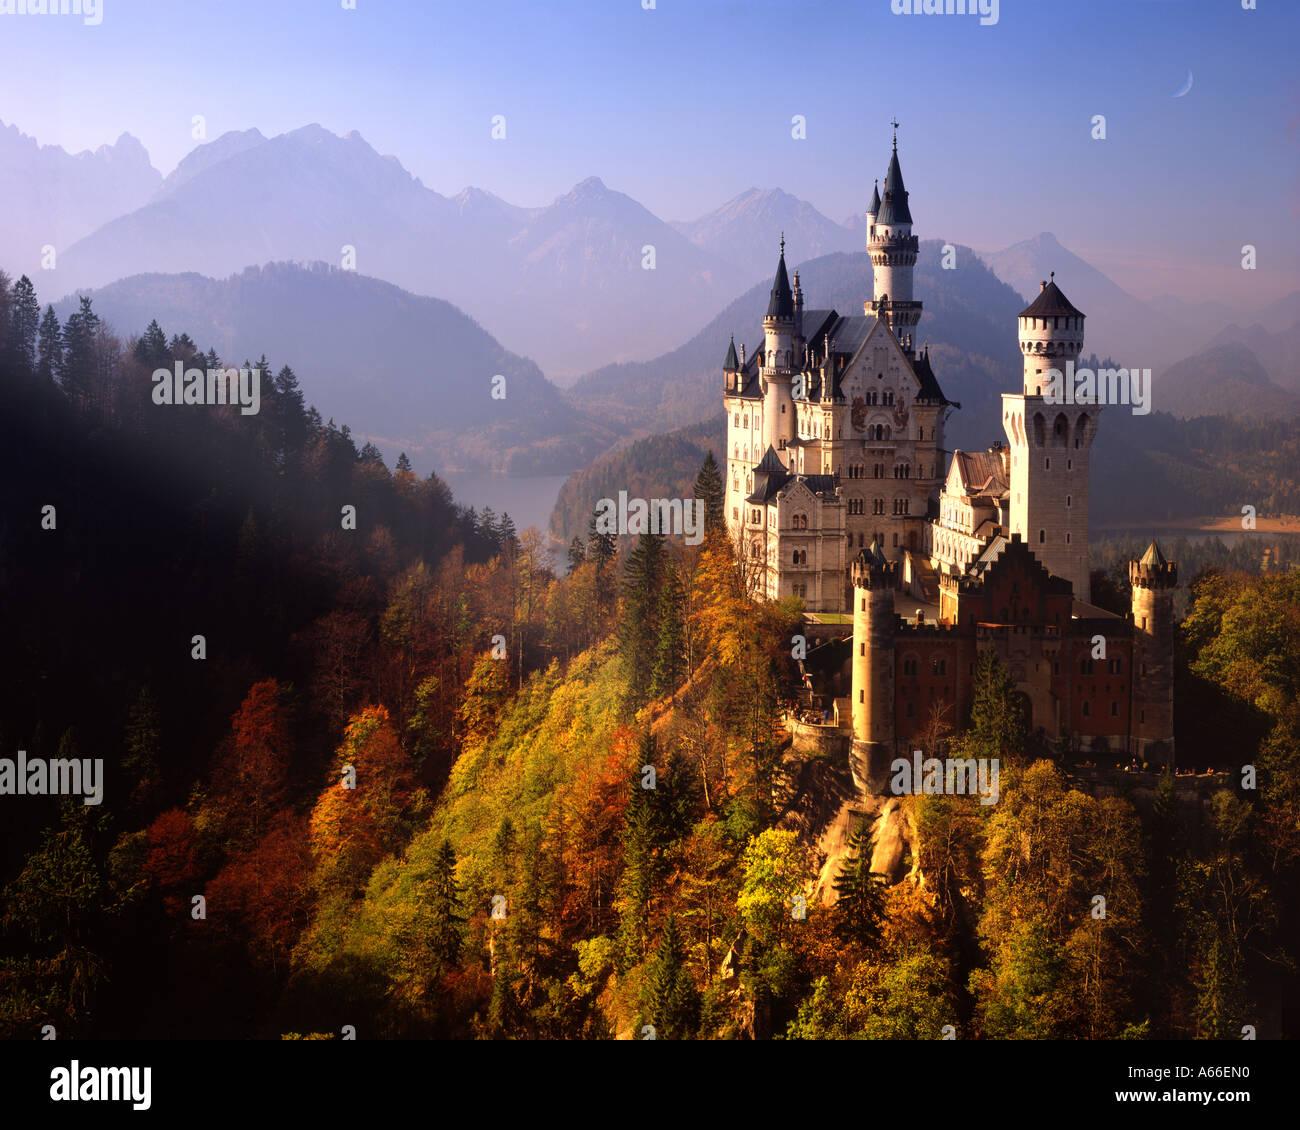 DE - Baviera: el castillo de Neuschwanstein Imagen De Stock